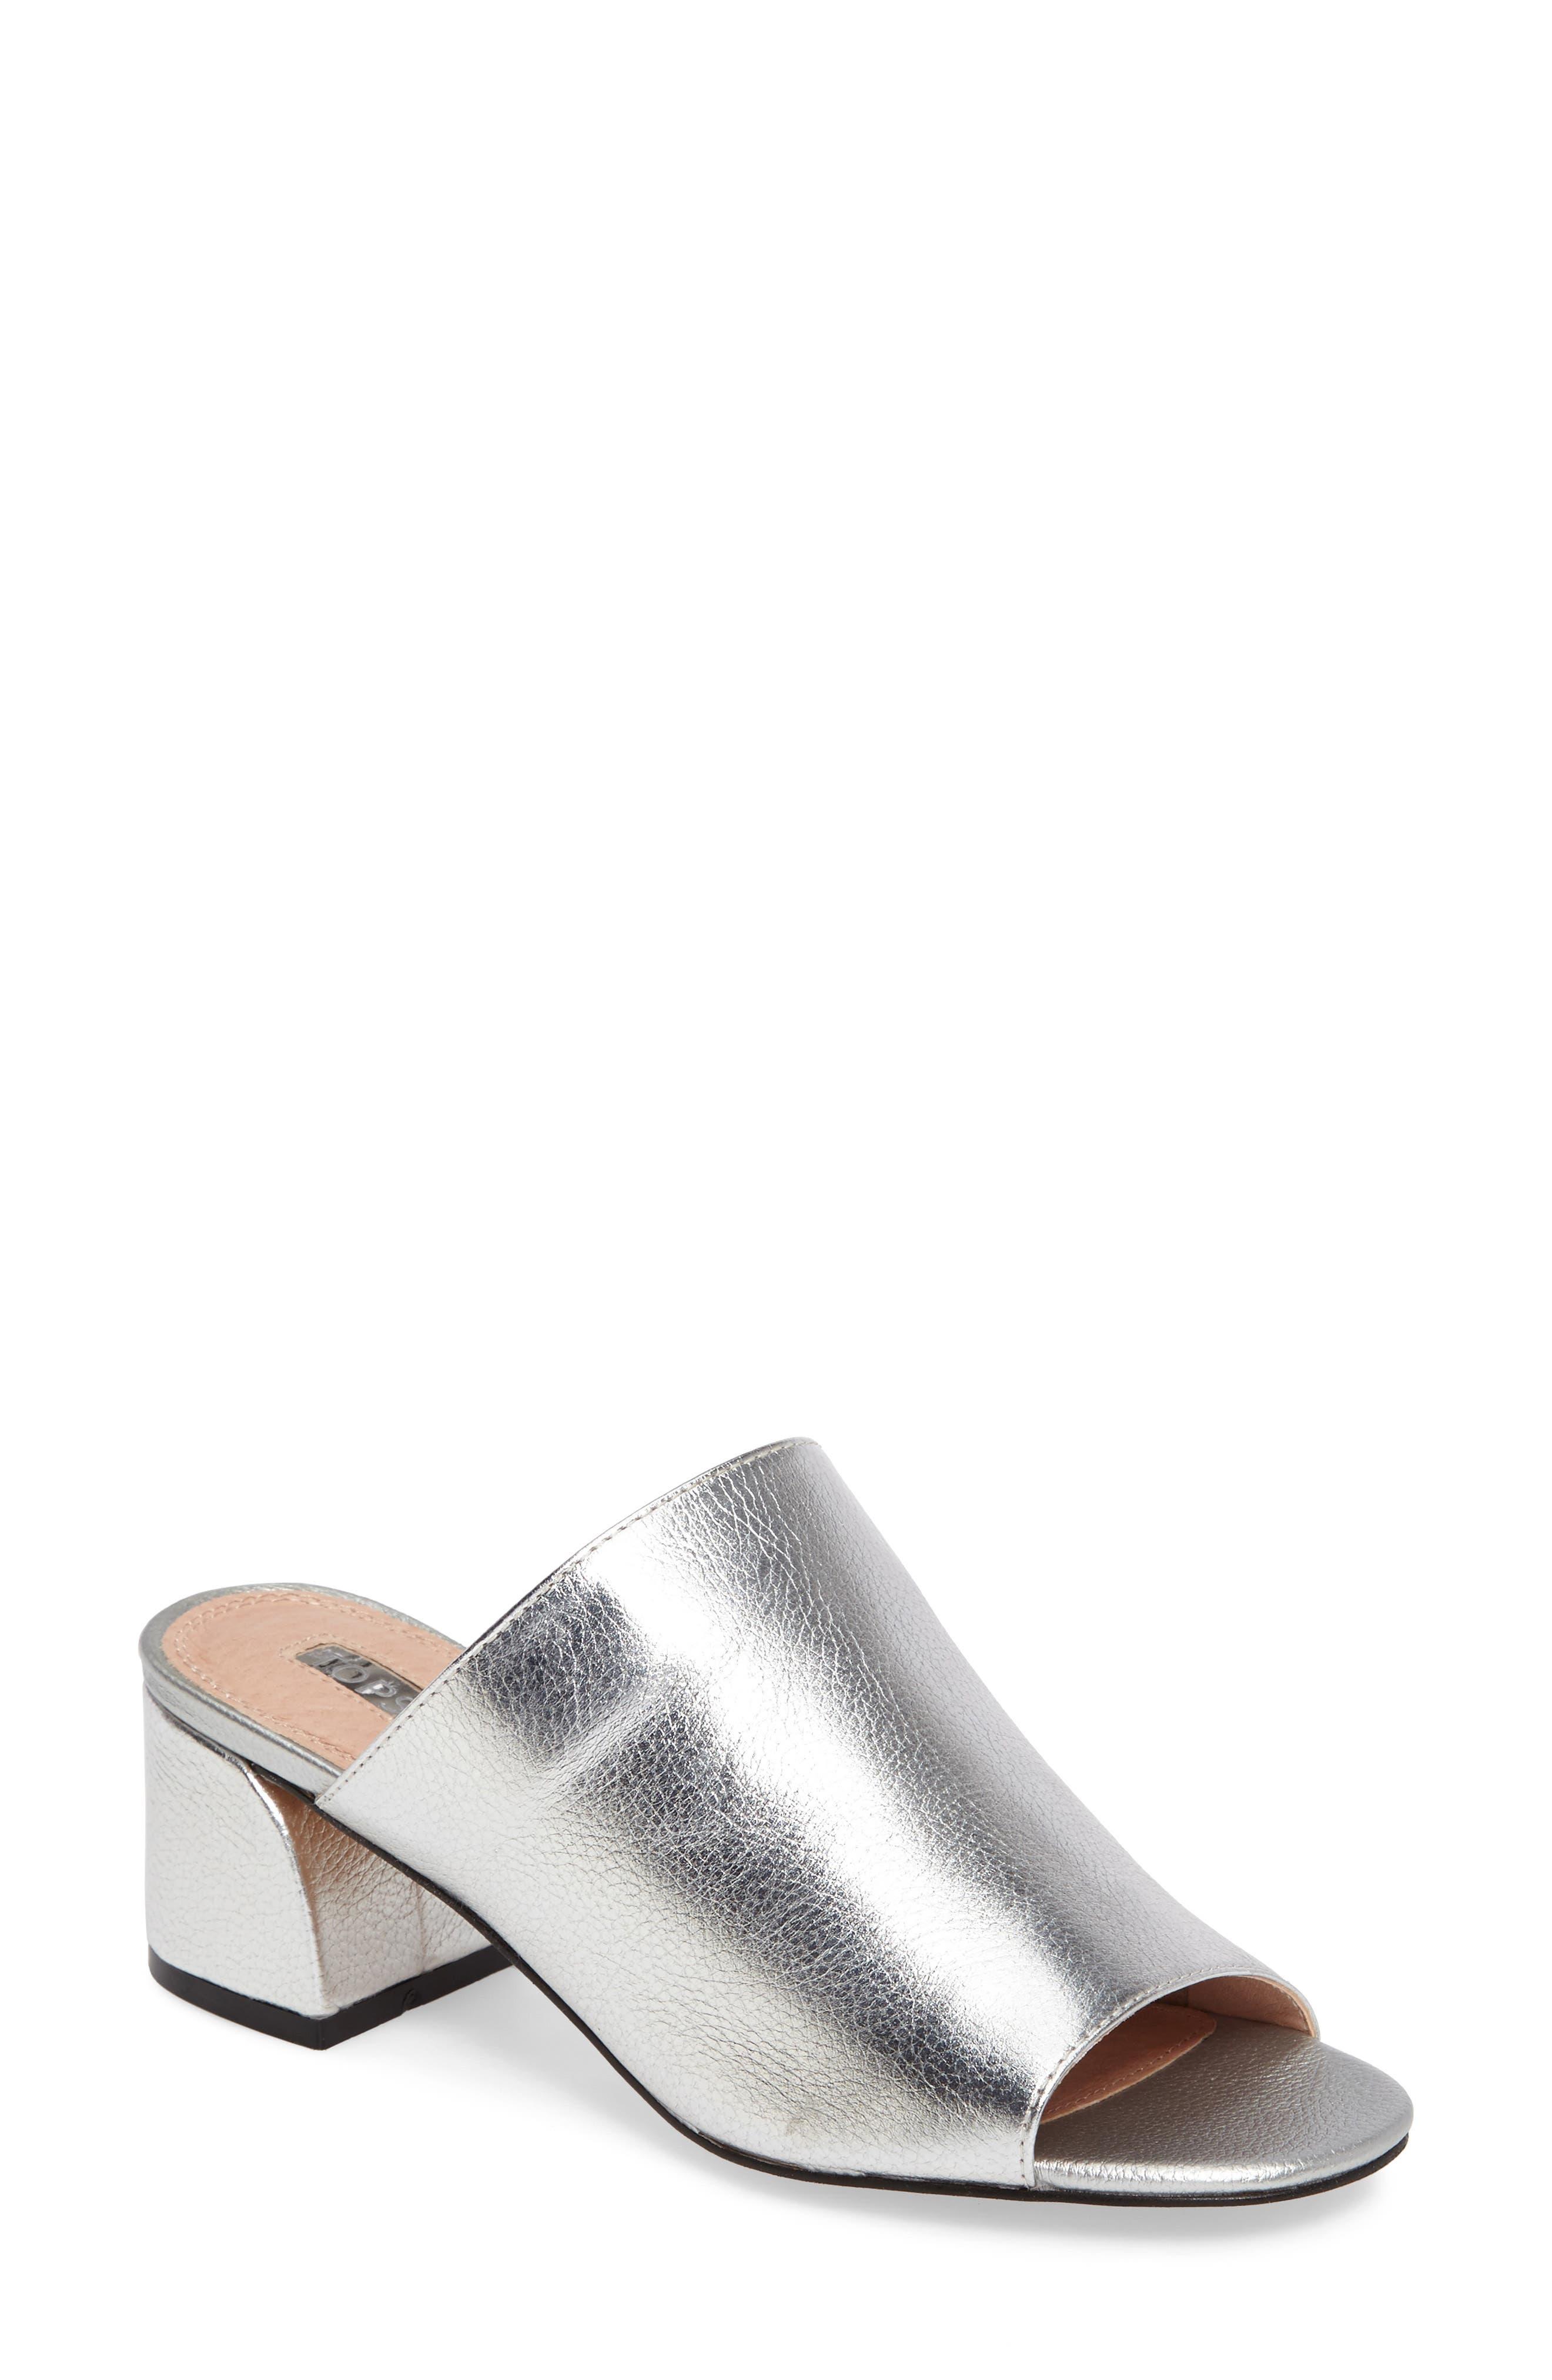 Notorious Metallic Slide Sandal,                         Main,                         color, 040